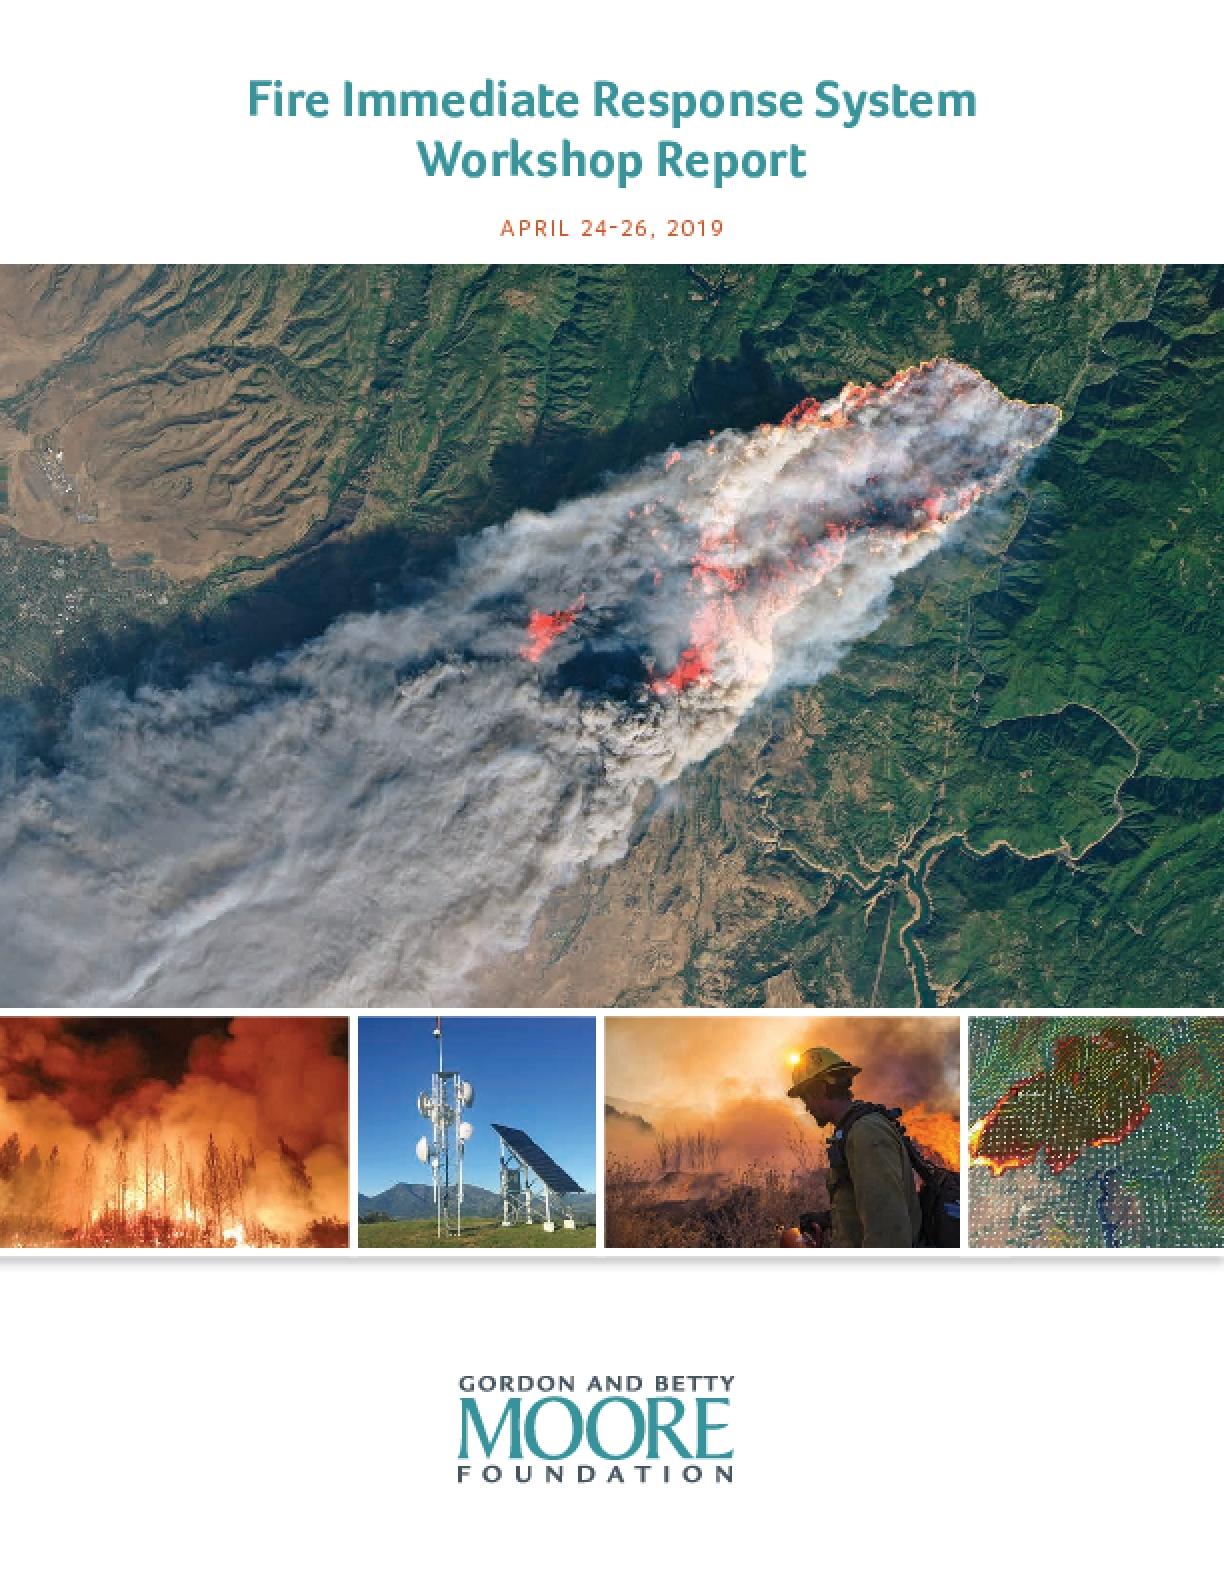 Fire Immediate Response System Workshop Report